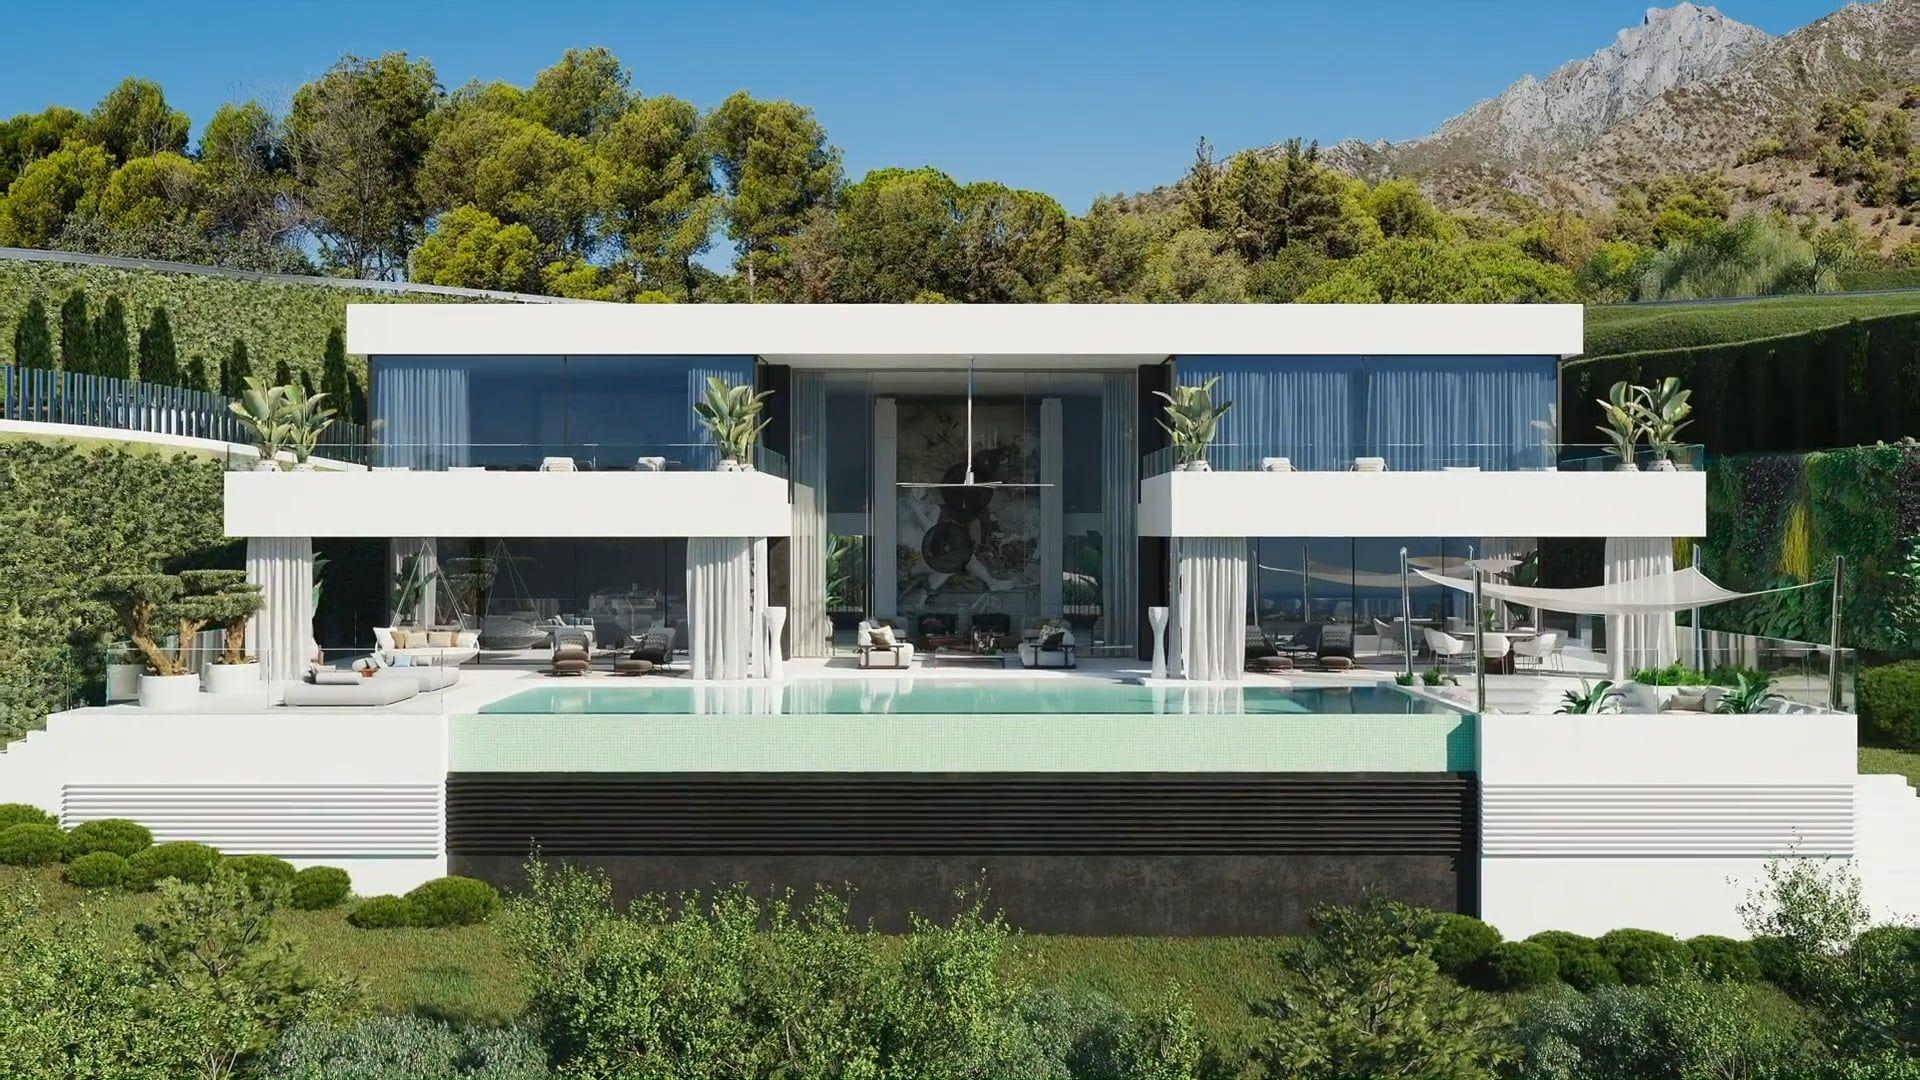 Mas443050 New Award Winning Luxury Villa In Marbella Marbella Villas Architecture Villa Design